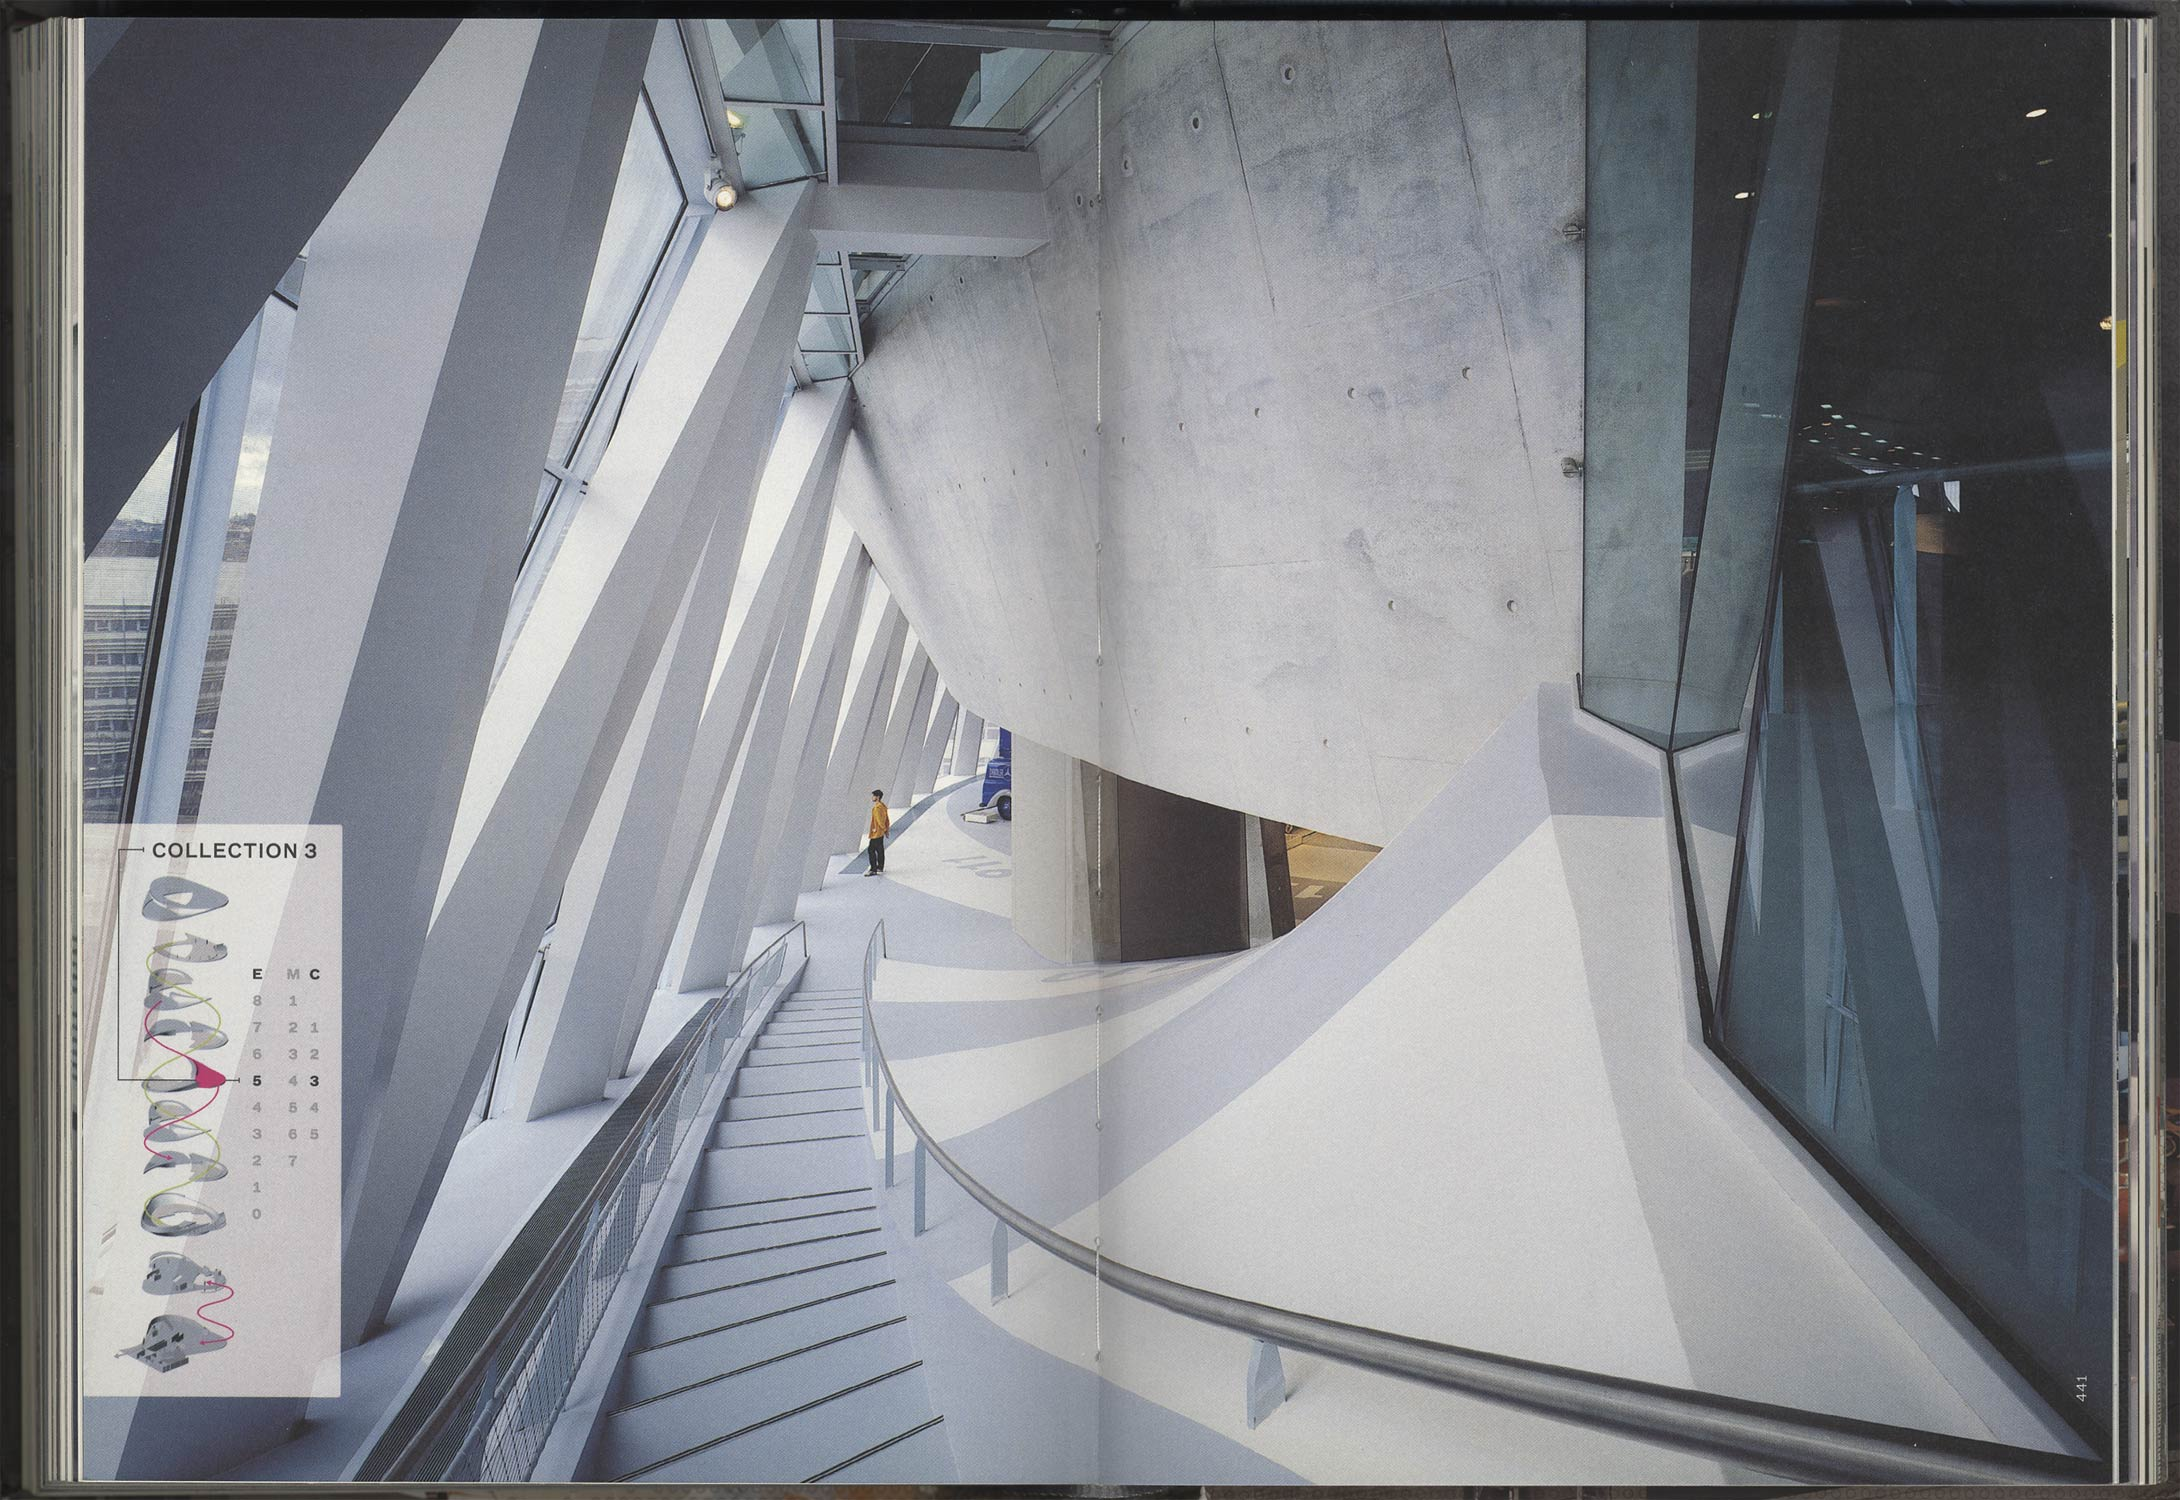 UN Studio : BUY ME A MERCEDES-BENZ The Book of the Museum[image4]